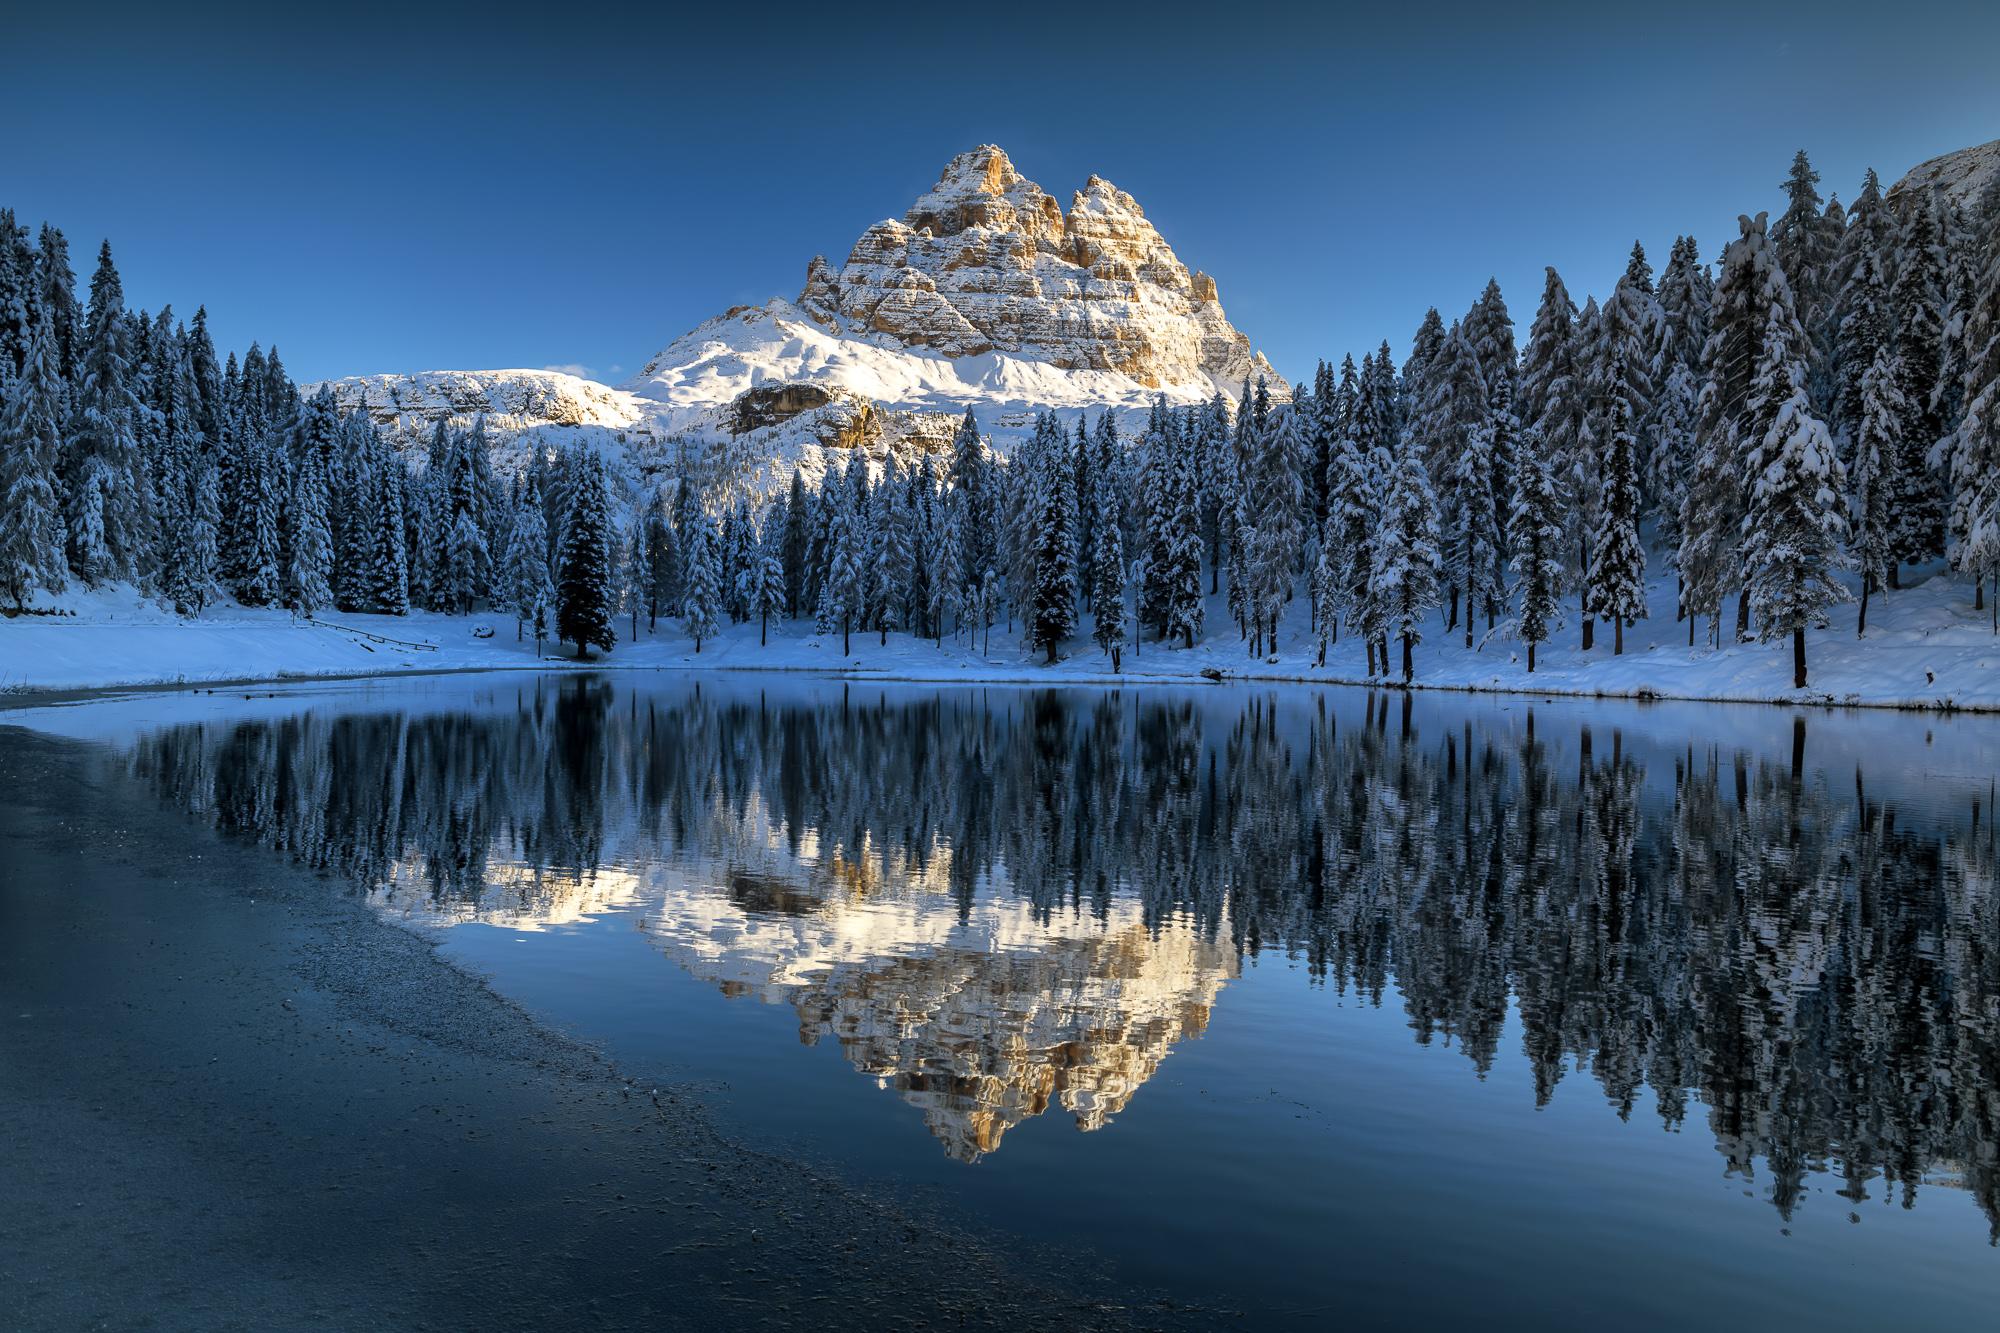 Tre Cime di Lavaredo Reflecting in Lago Antorno, Dolomites, Italy